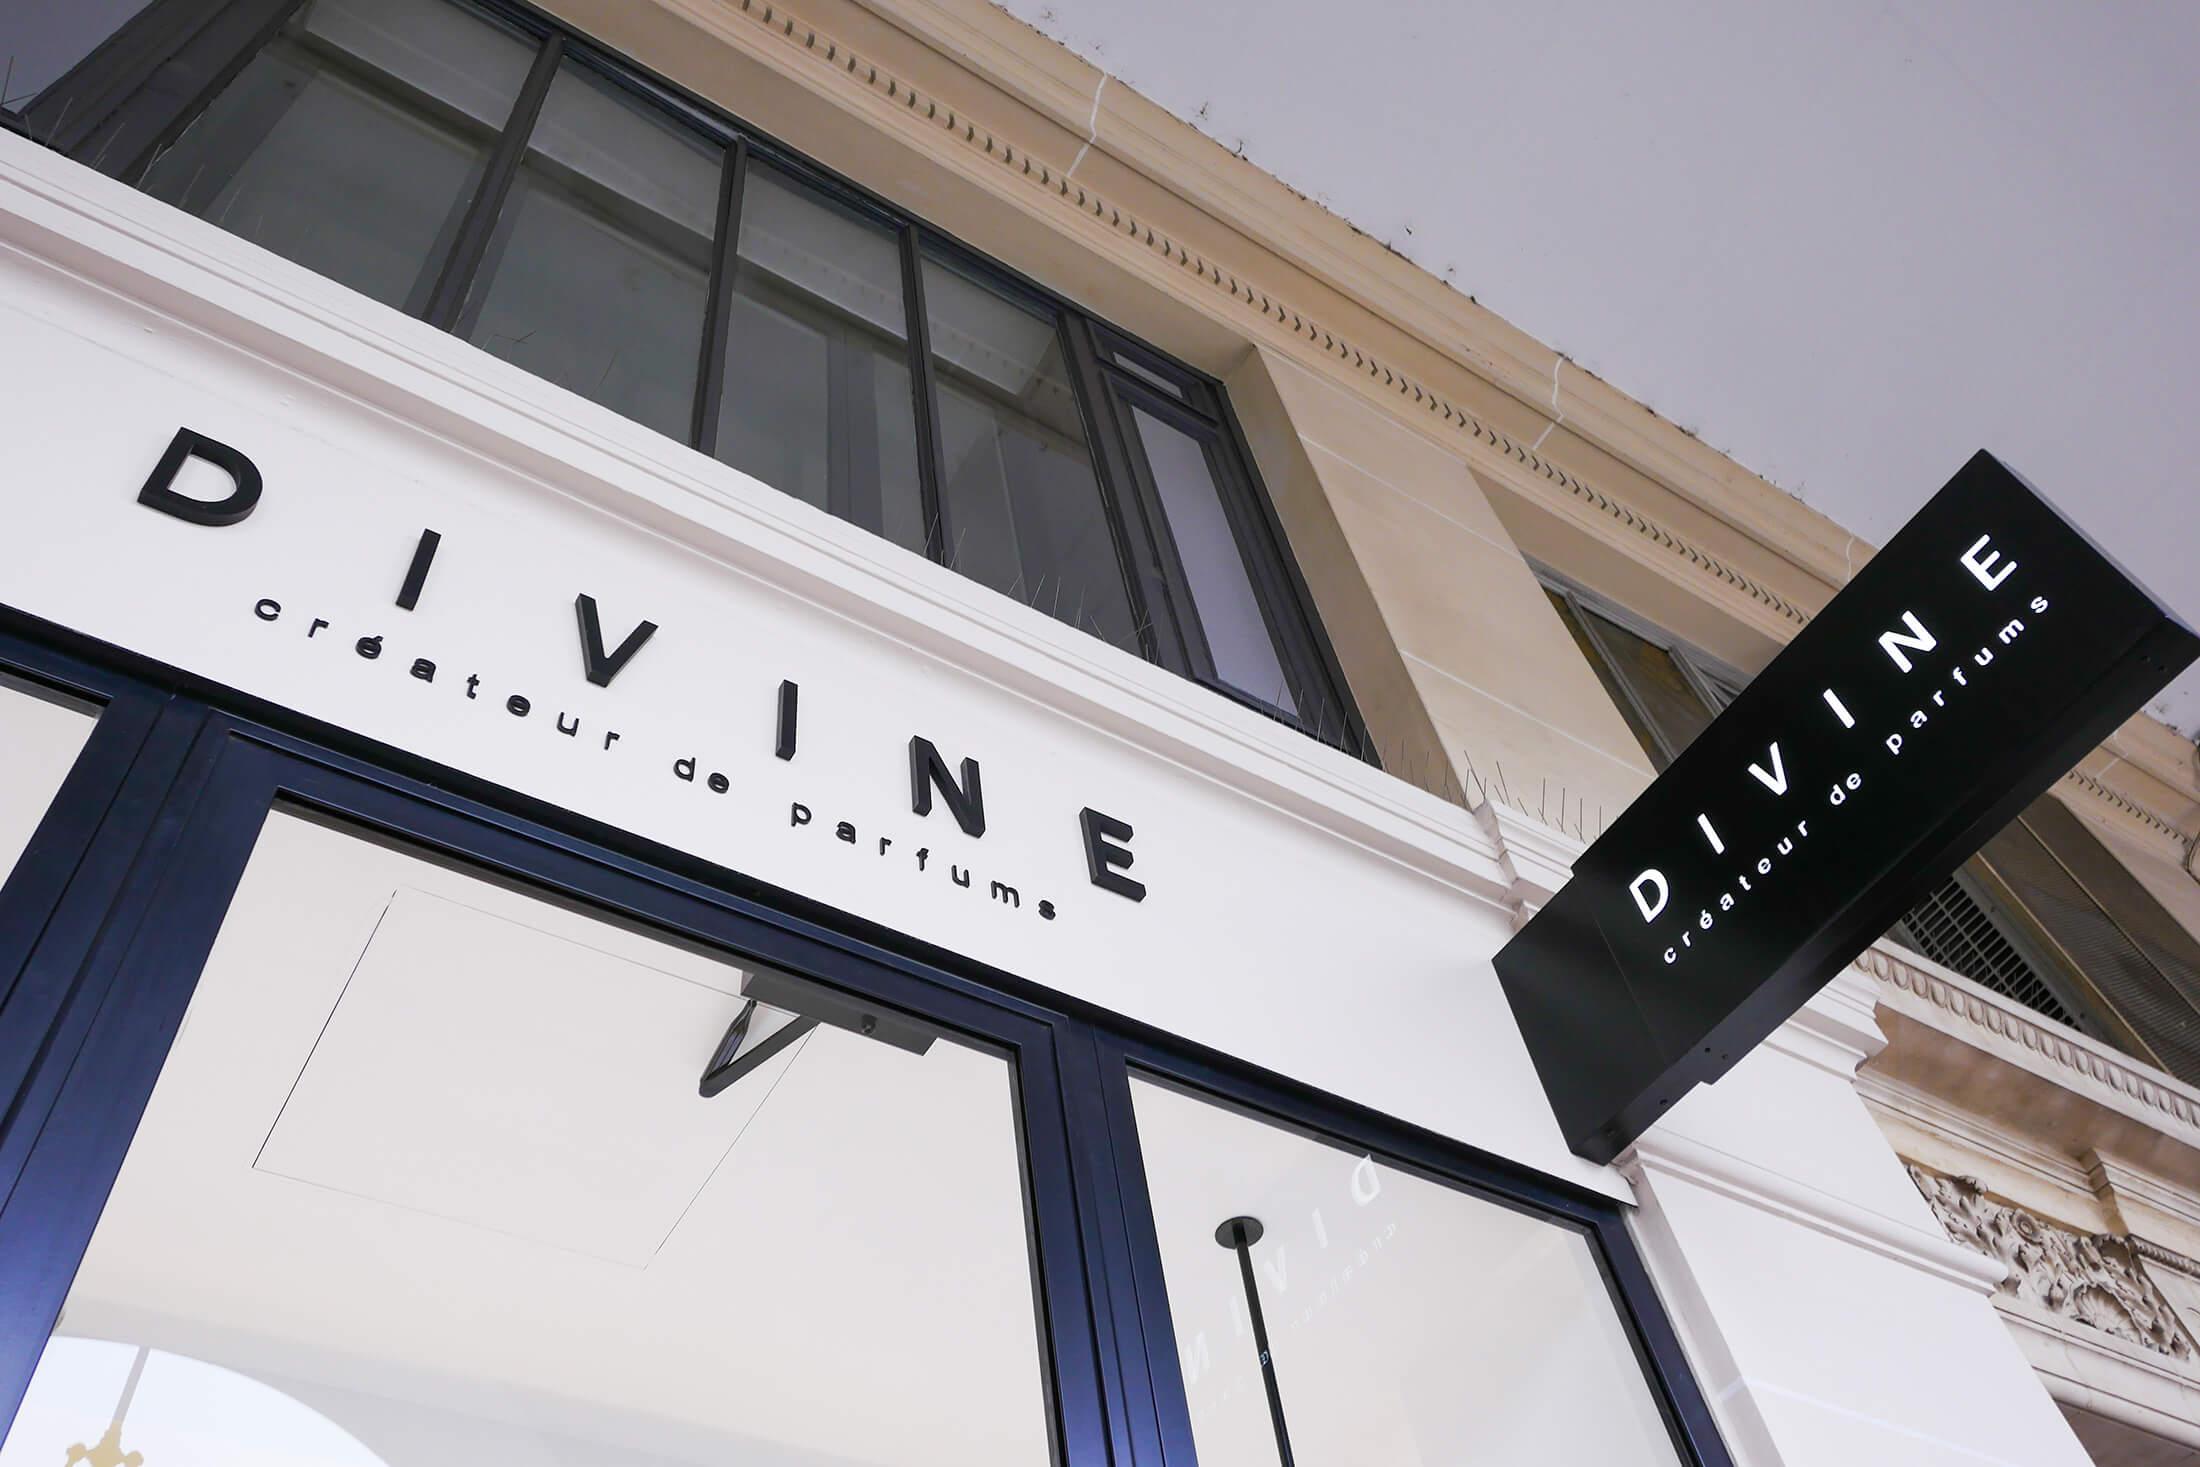 shop divine france and internationally